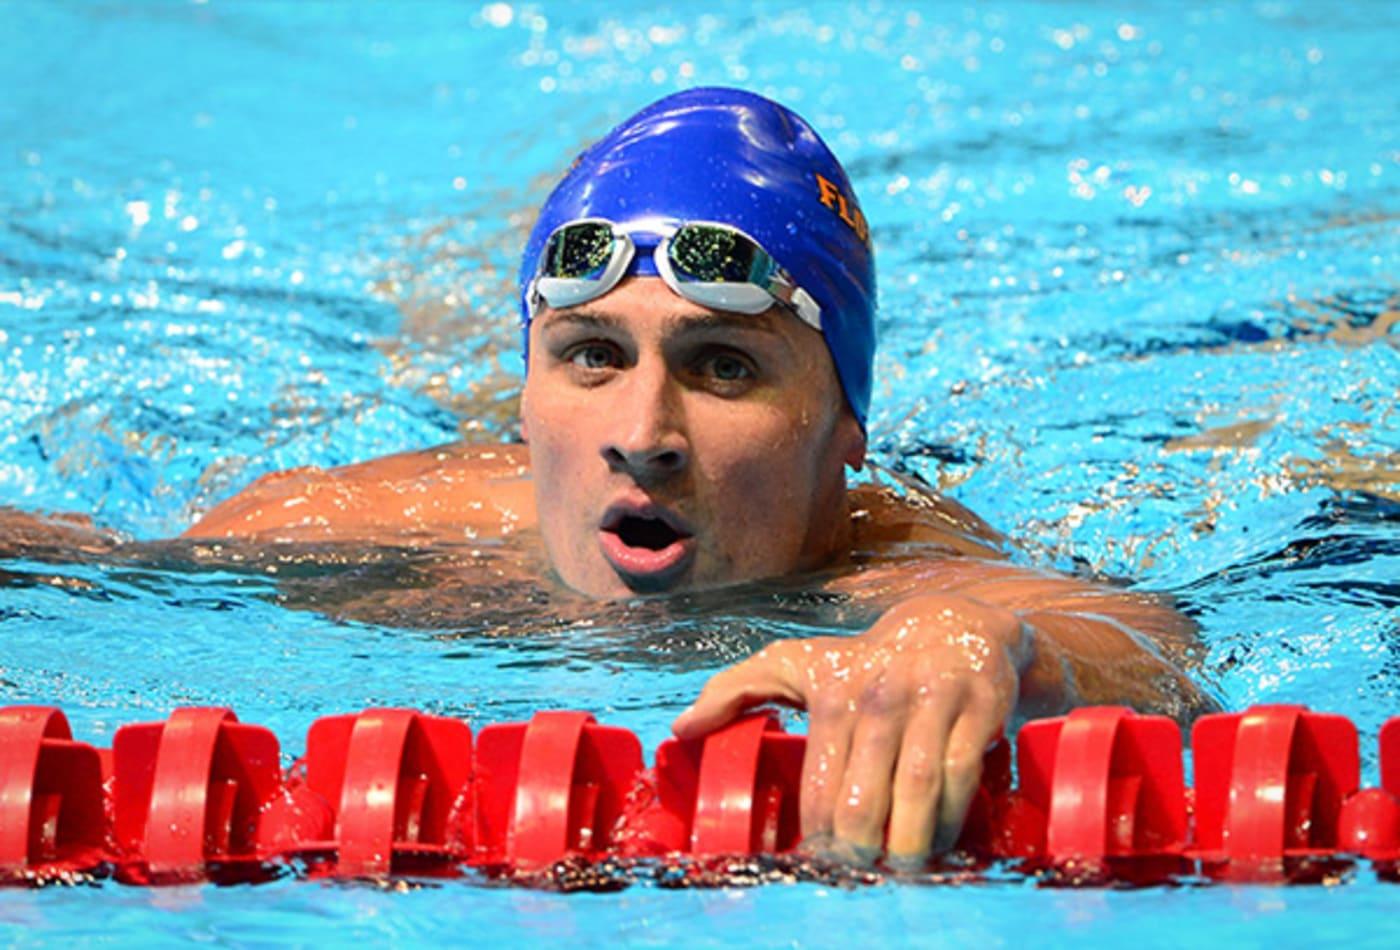 10-Most-Marketable-Summer-Olympians-Ryan-Lochte.jpg